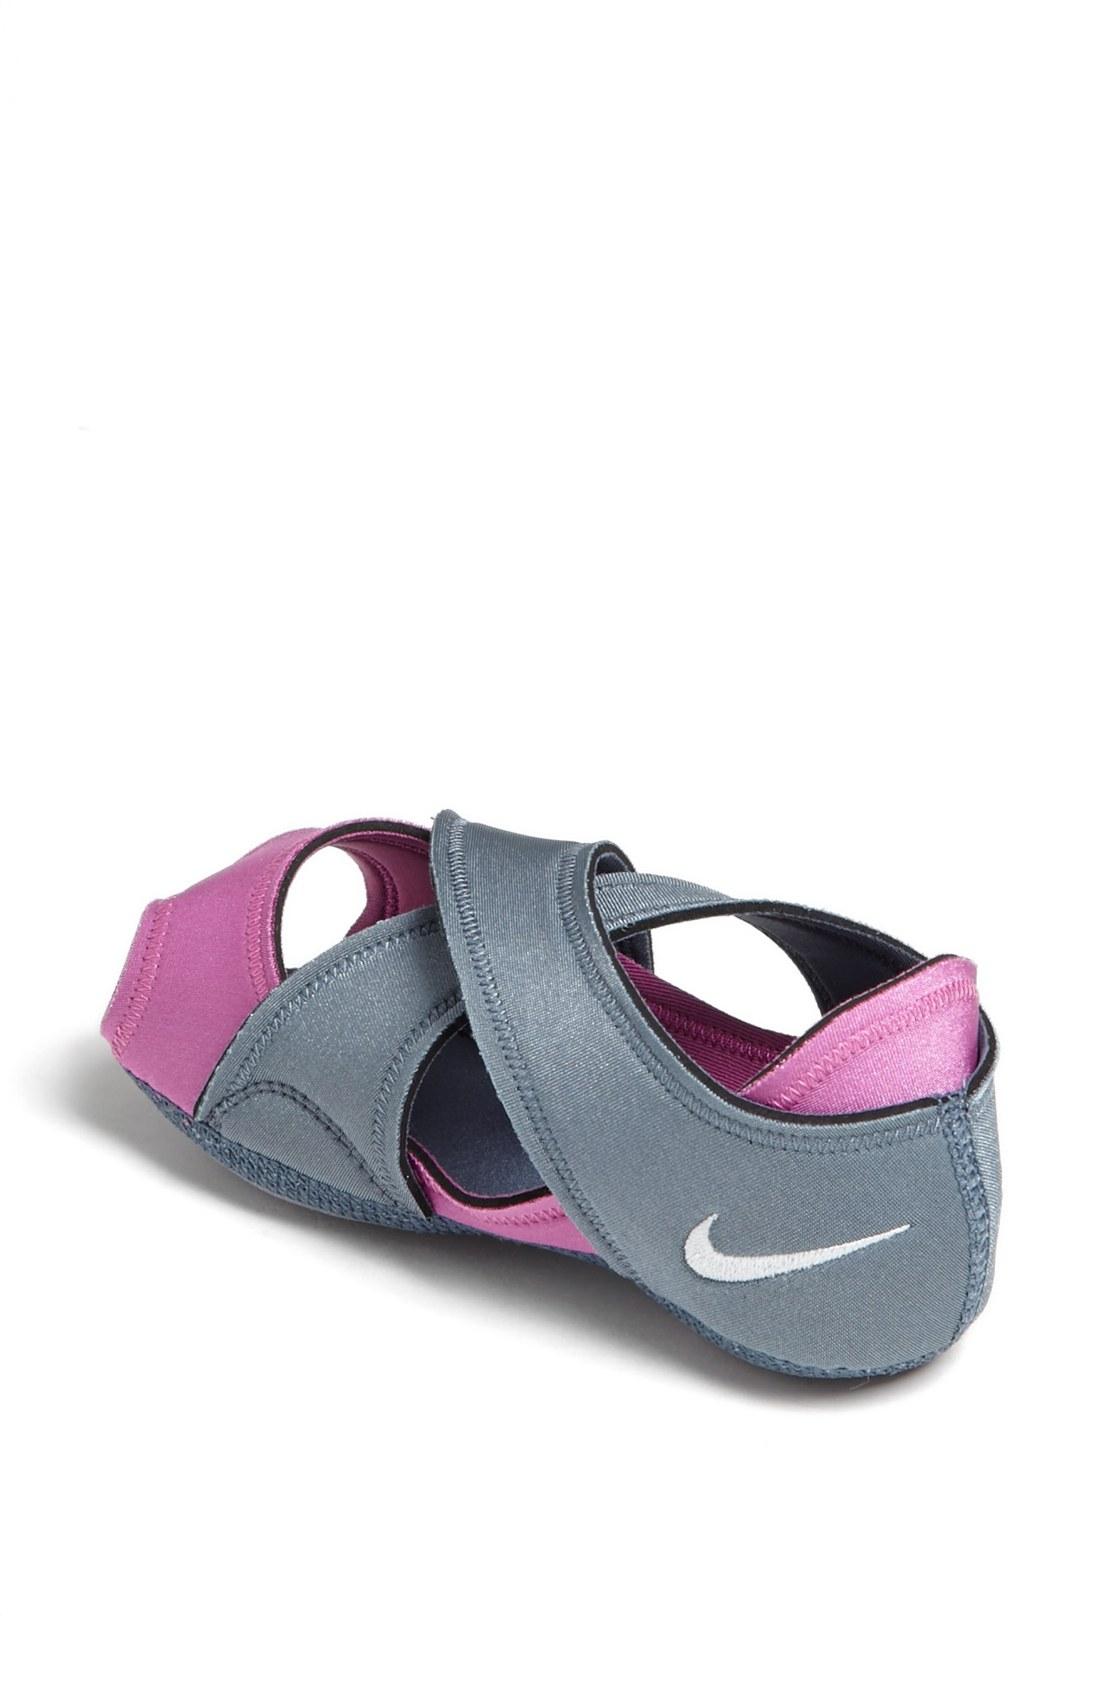 nike studio wrap shoe in gray slate club pink